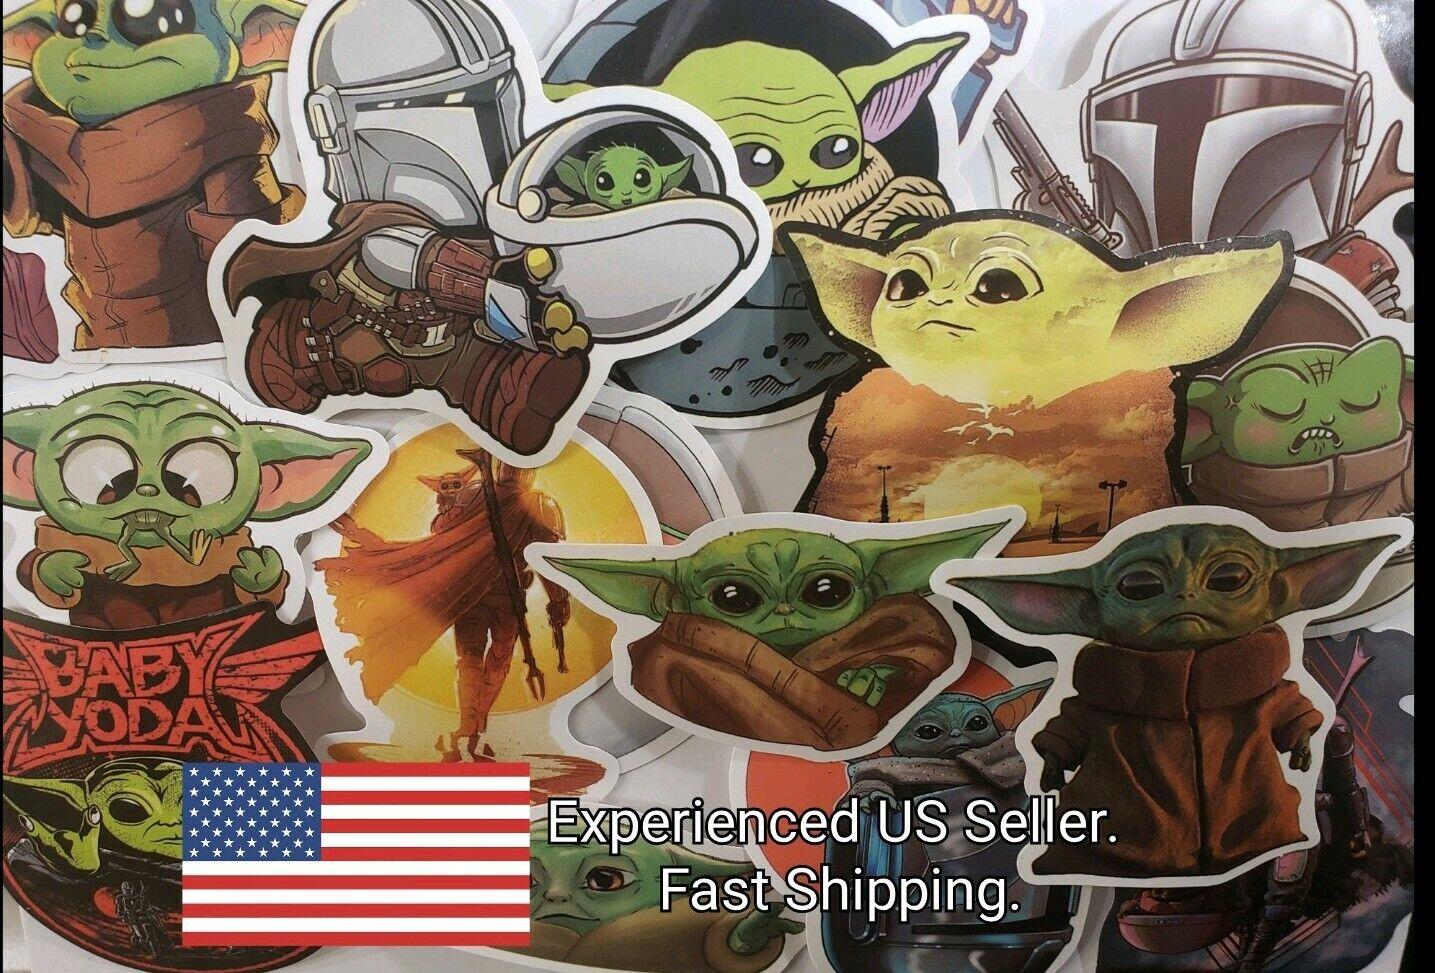 Home Decoration - Baby Yoda Stickers Decals 50 Pack Mandalorian Star Wars The Child Darksaber